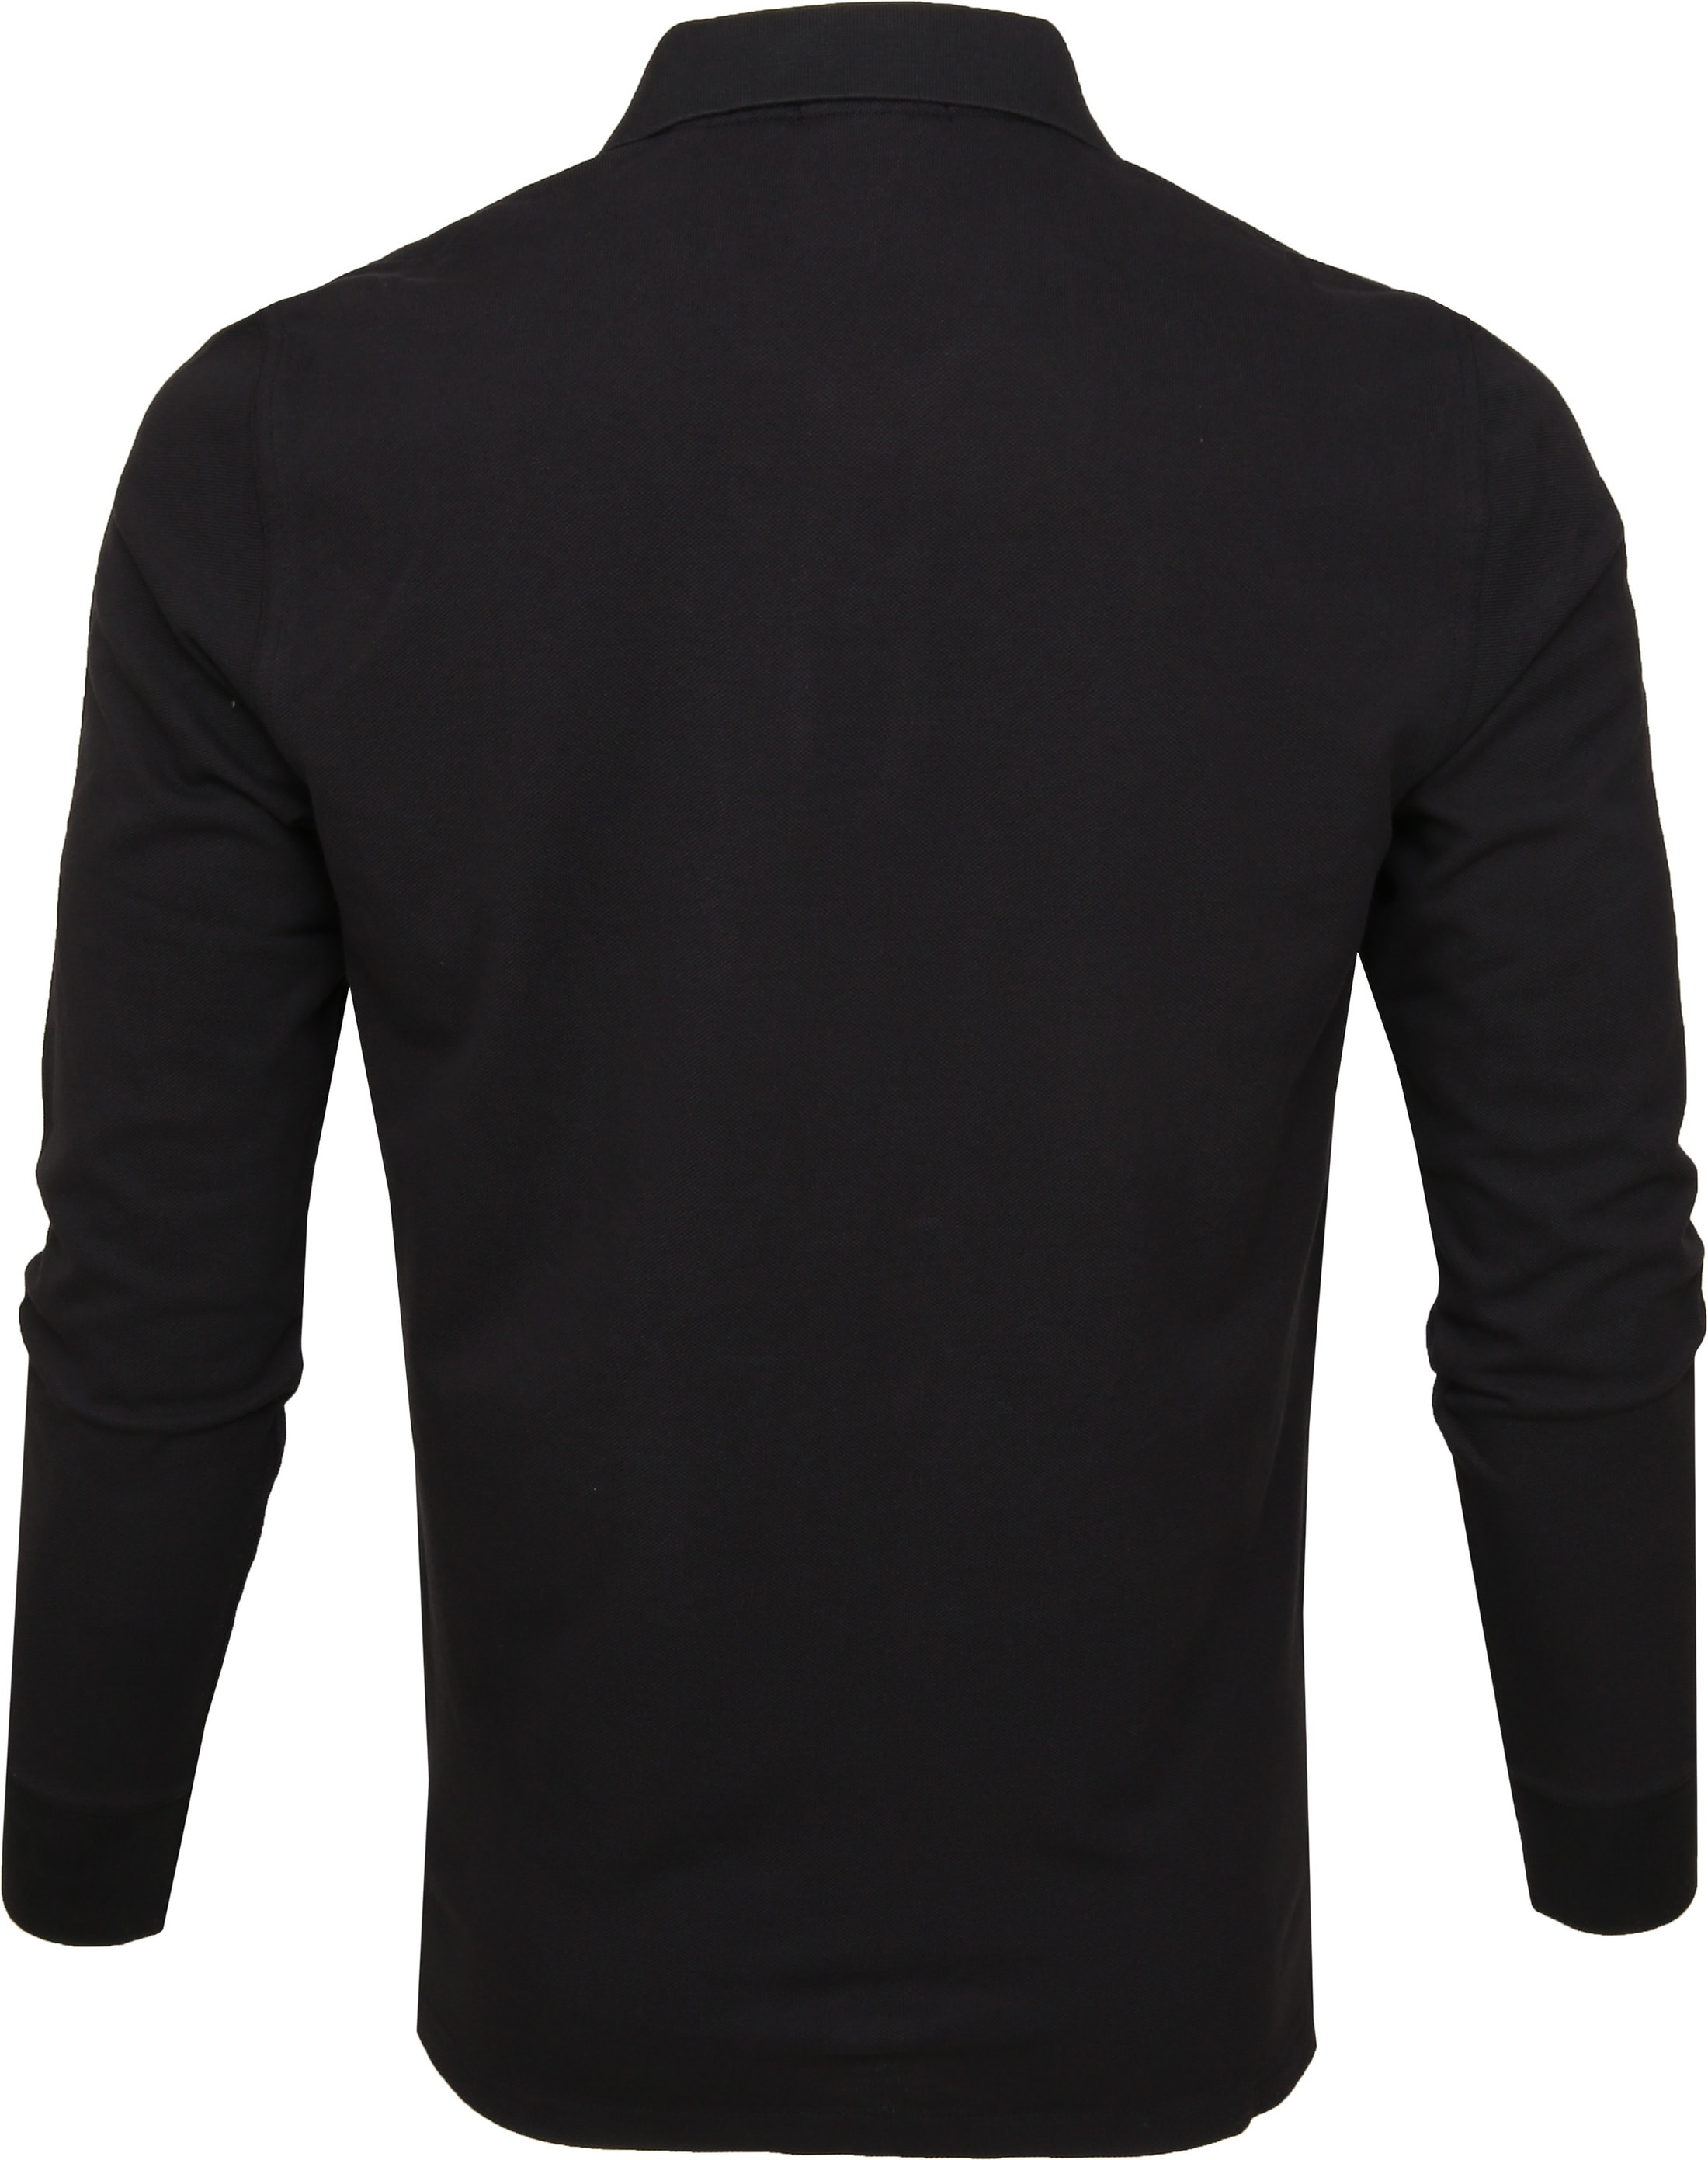 Gant Rugger Poloshirt LS Black foto 3